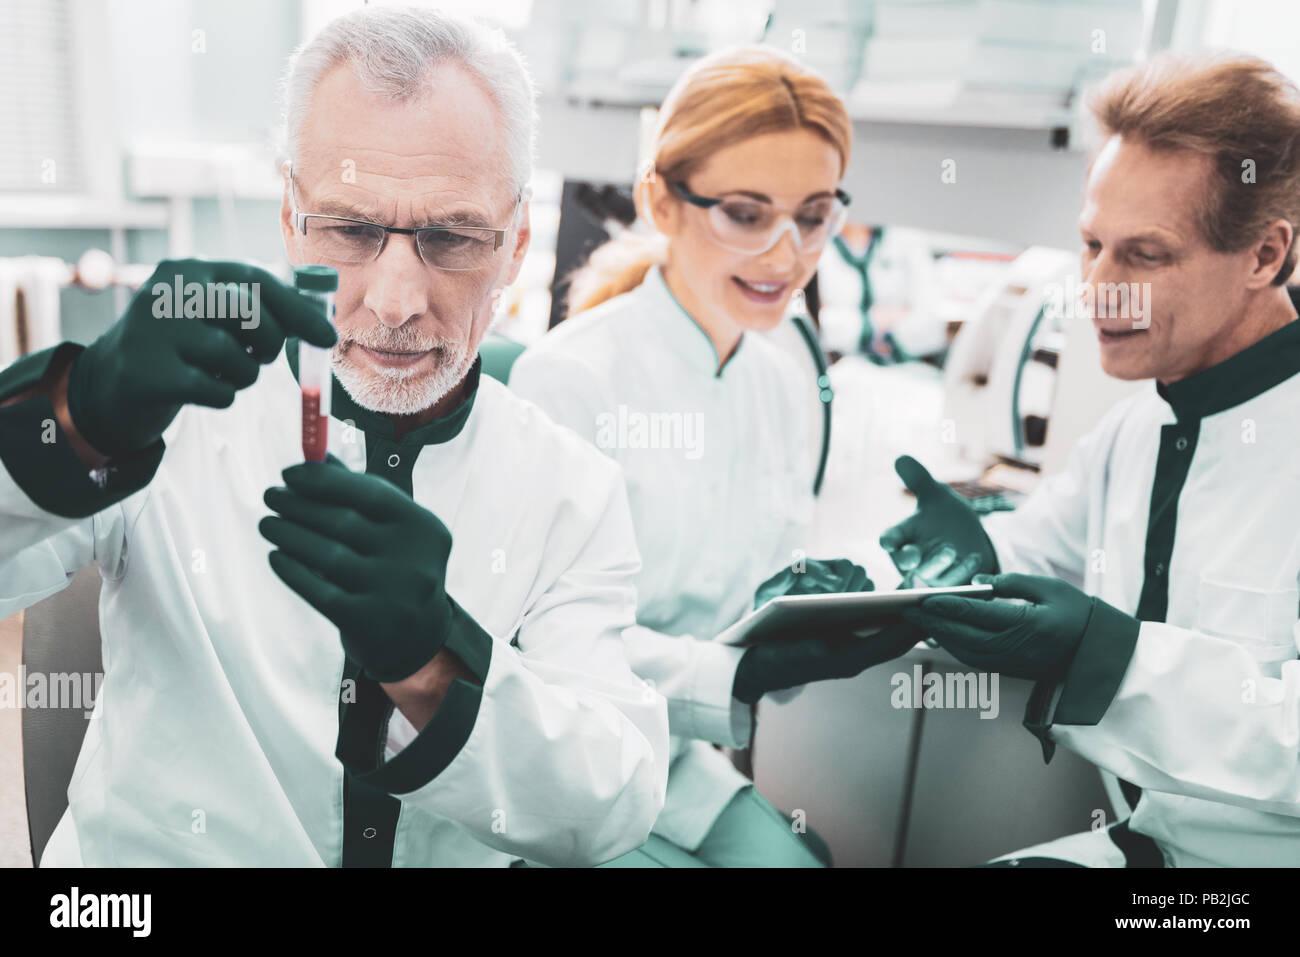 Tre ricercatori scientifici in guanti verde Immagini Stock